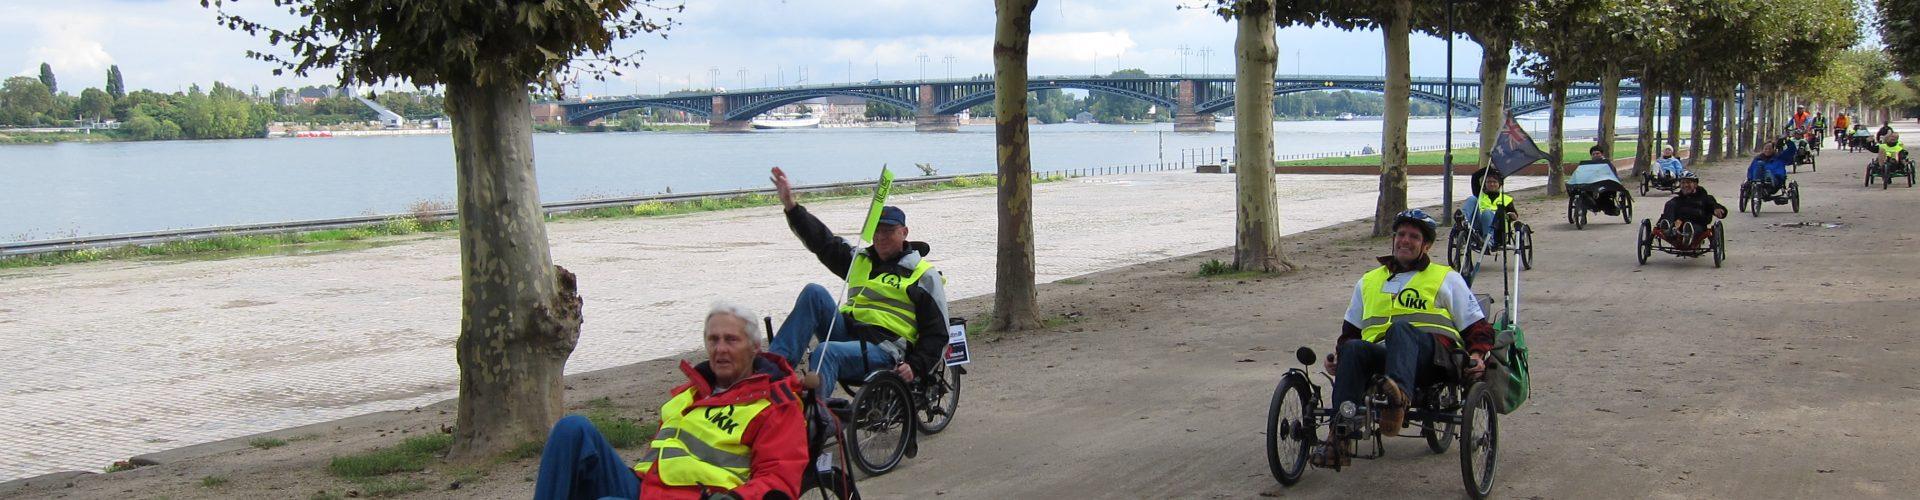 radfahrlust-Tour 2013: Mainz